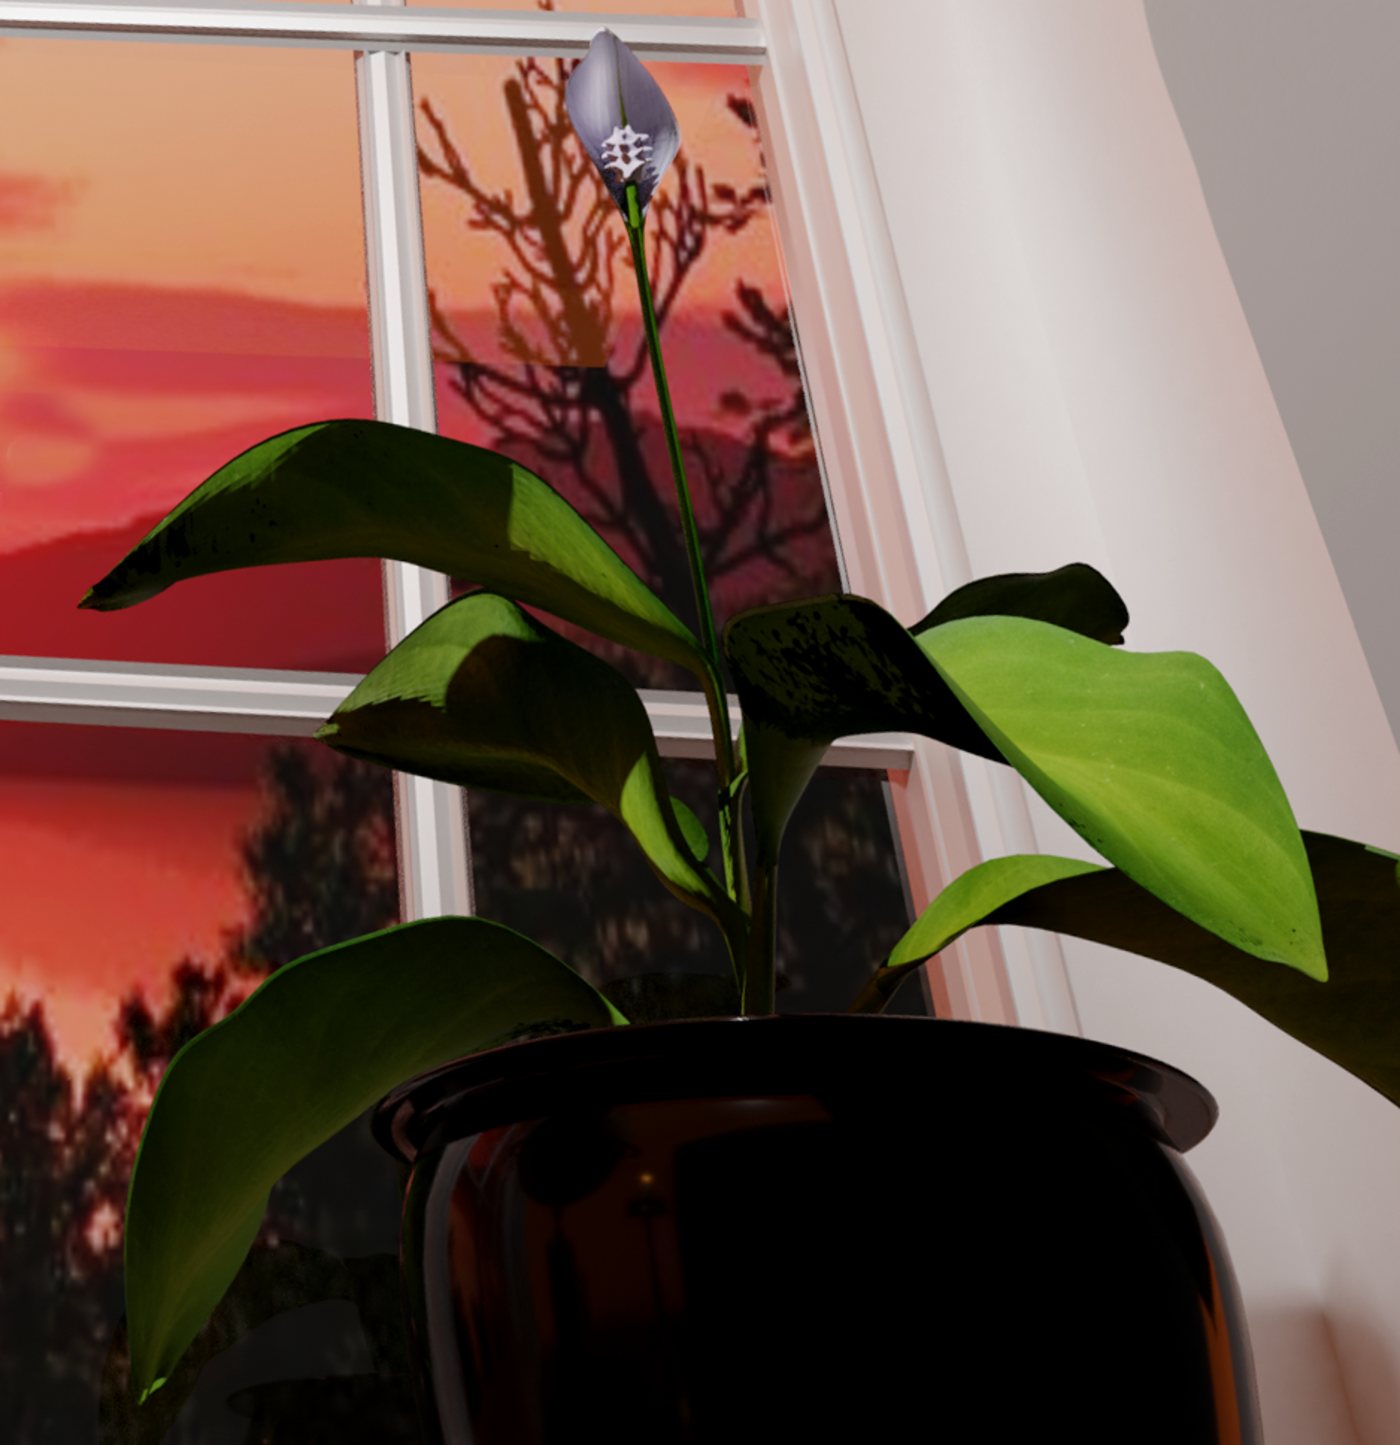 Spatifillum plant